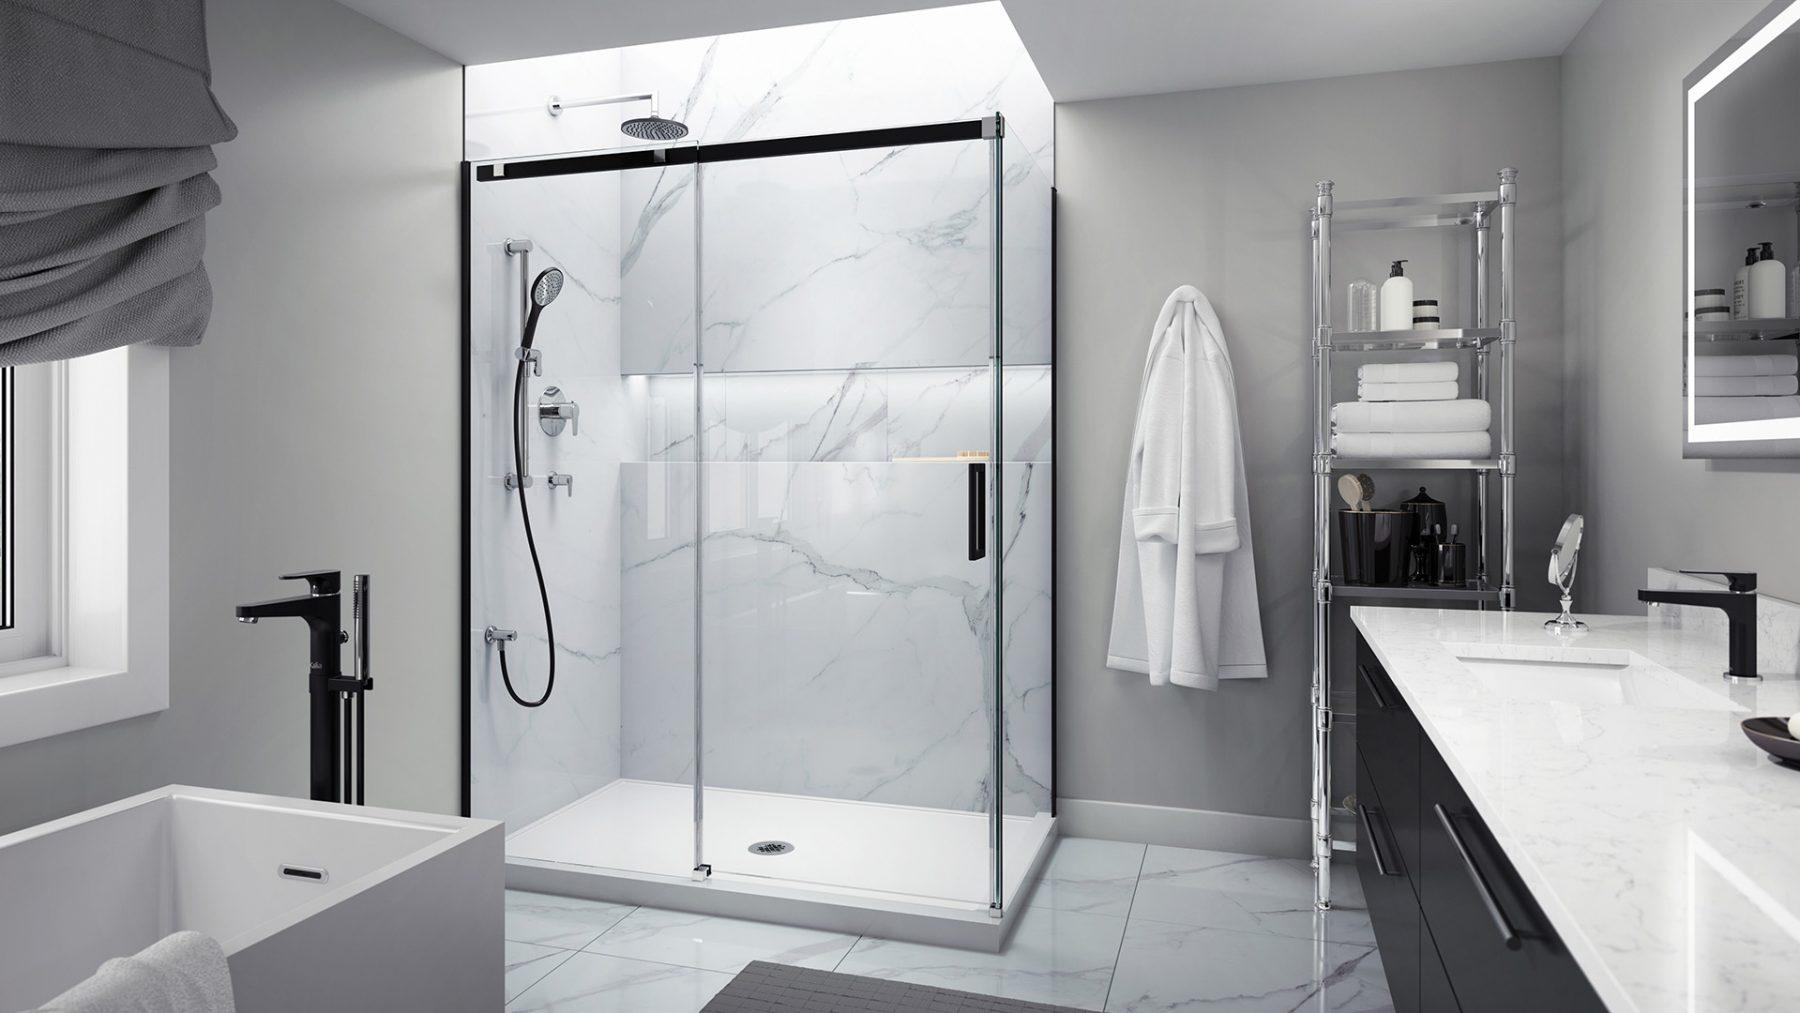 studio-animation-3d-salle-de-bain-blanche-design